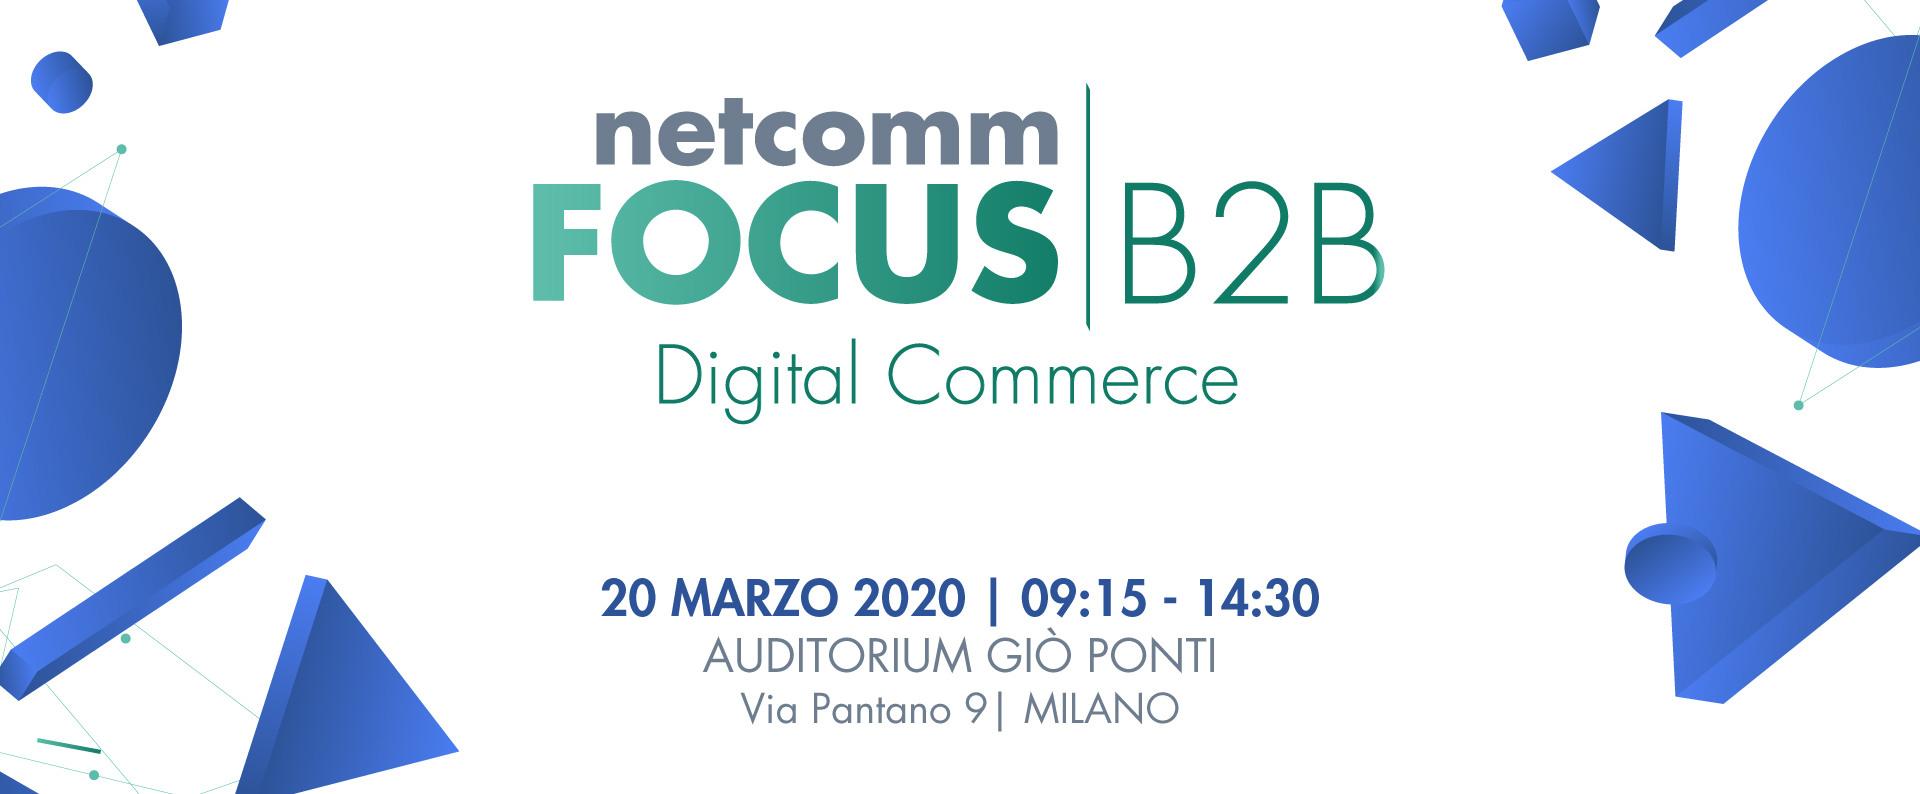 Netcomm FOCUS B2B Digital Commerce 2020